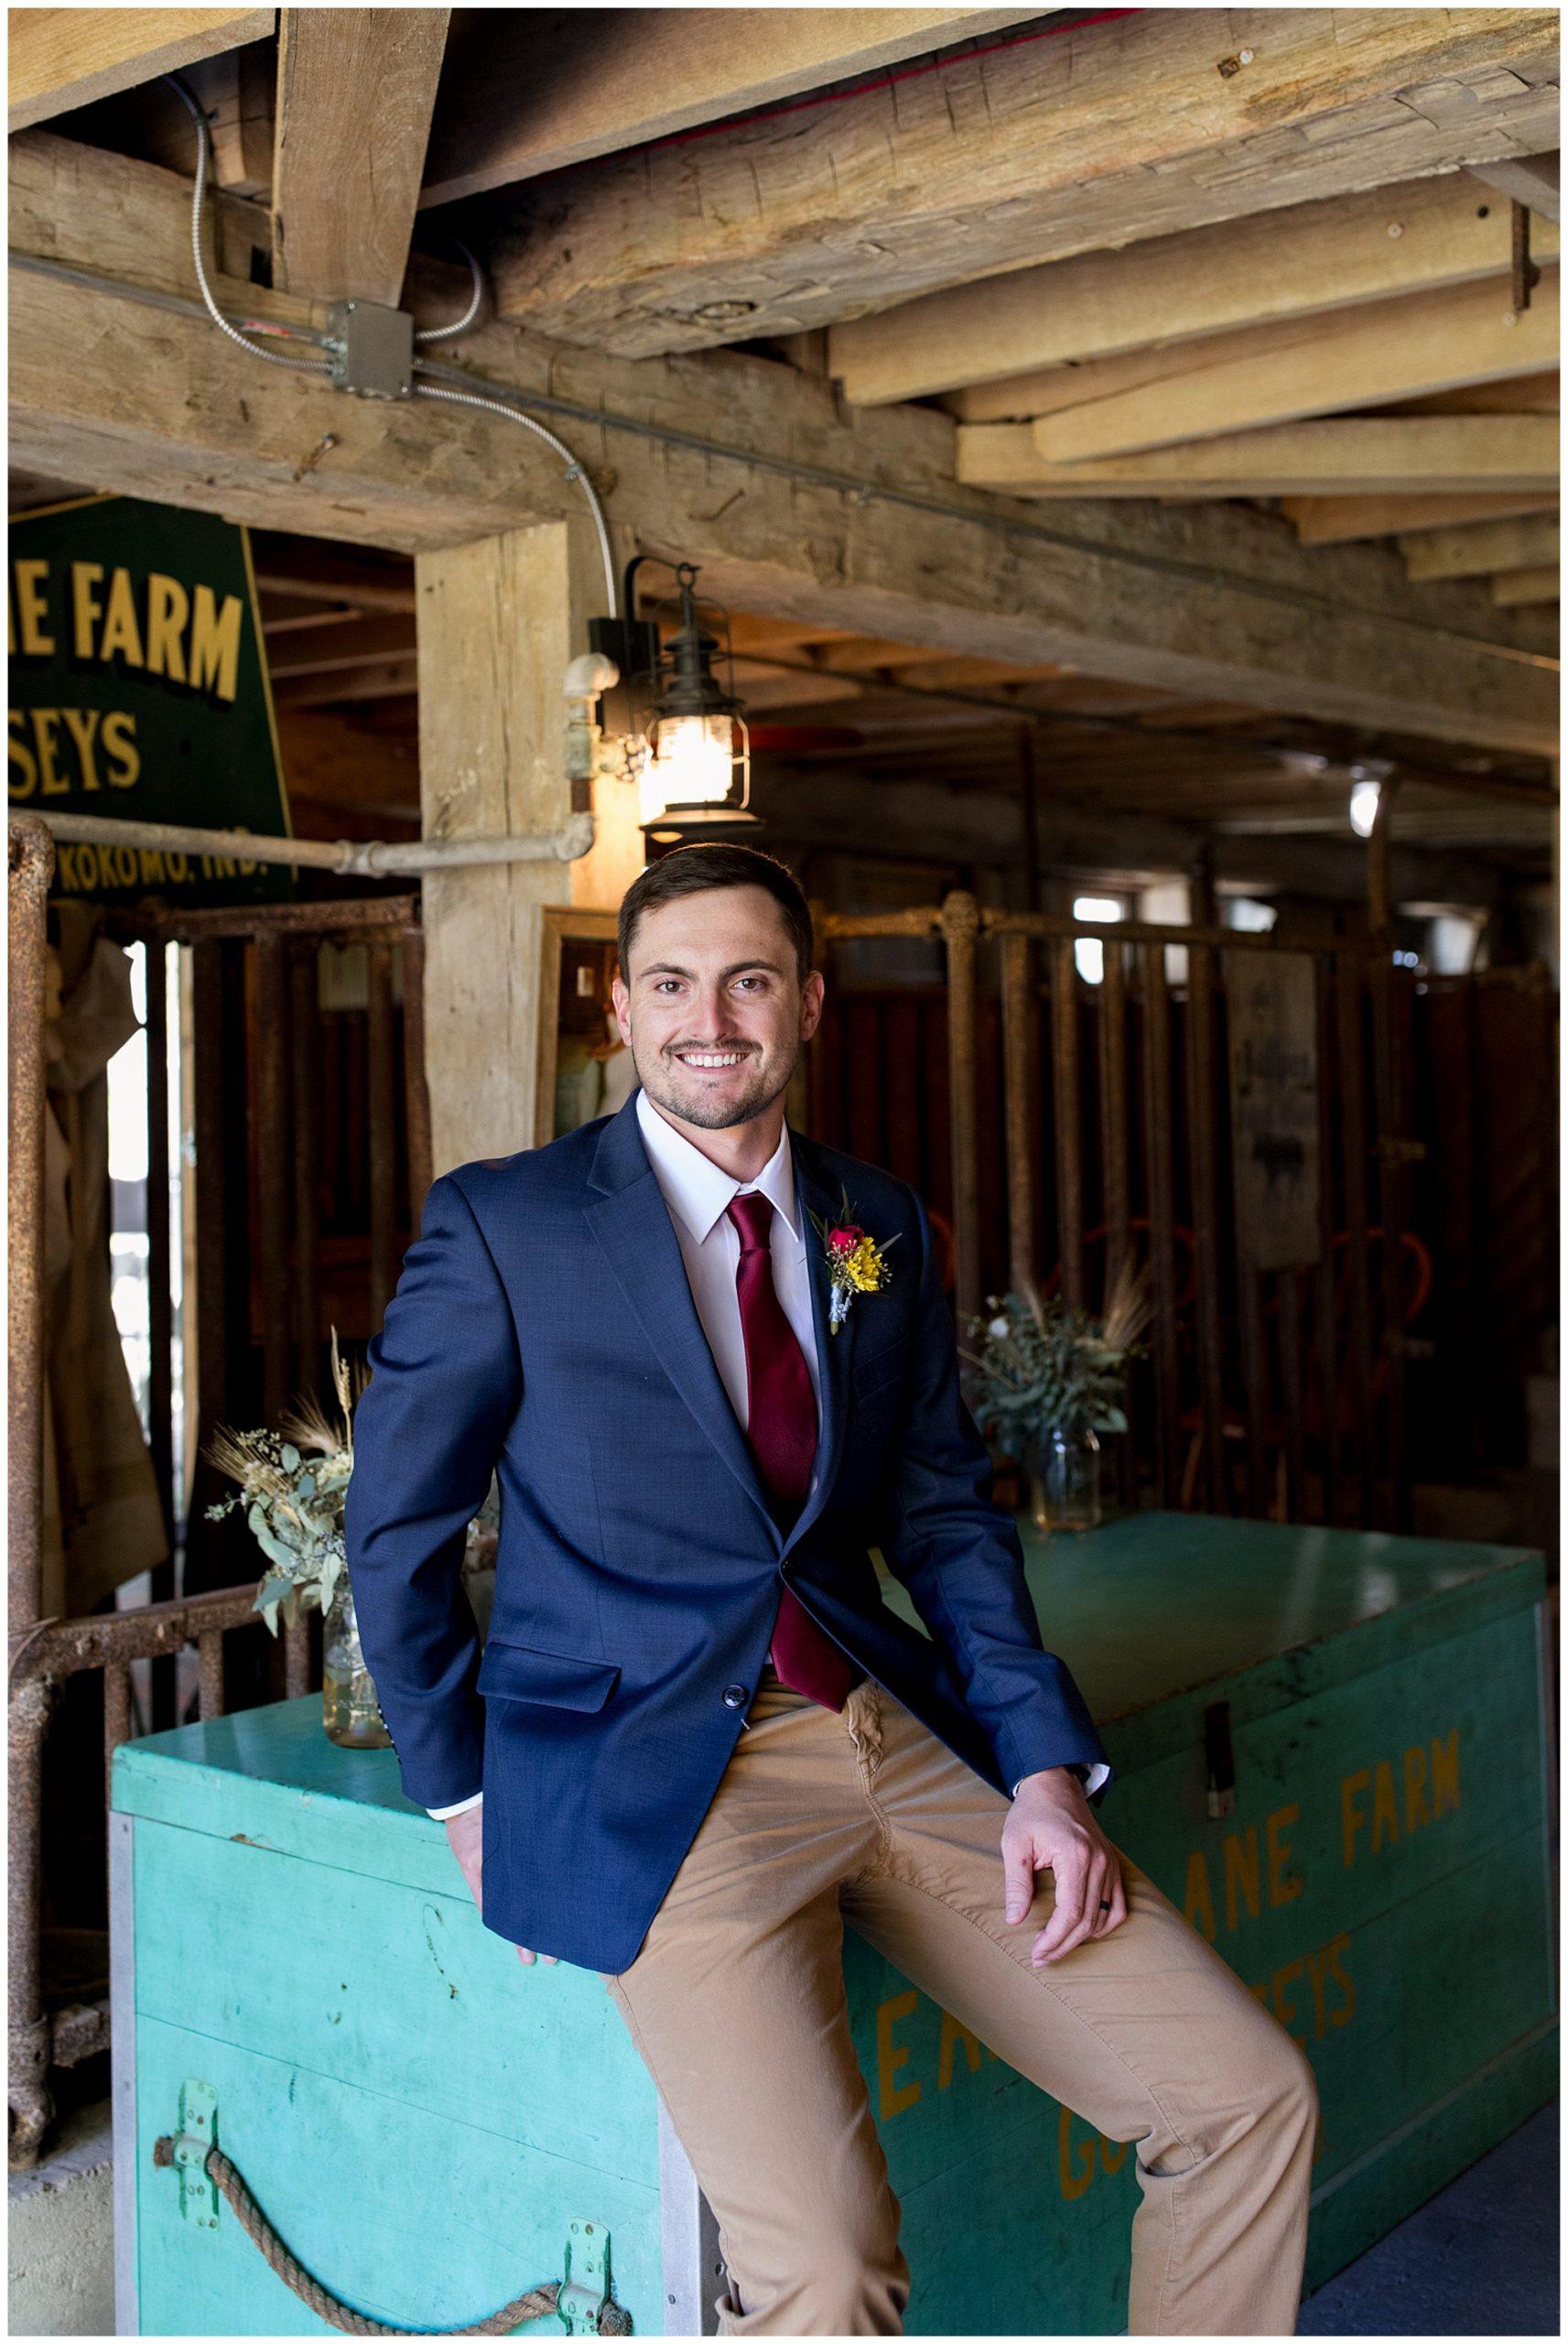 groom portraits before wedding at Legacy Barn in Kokomo Indiana